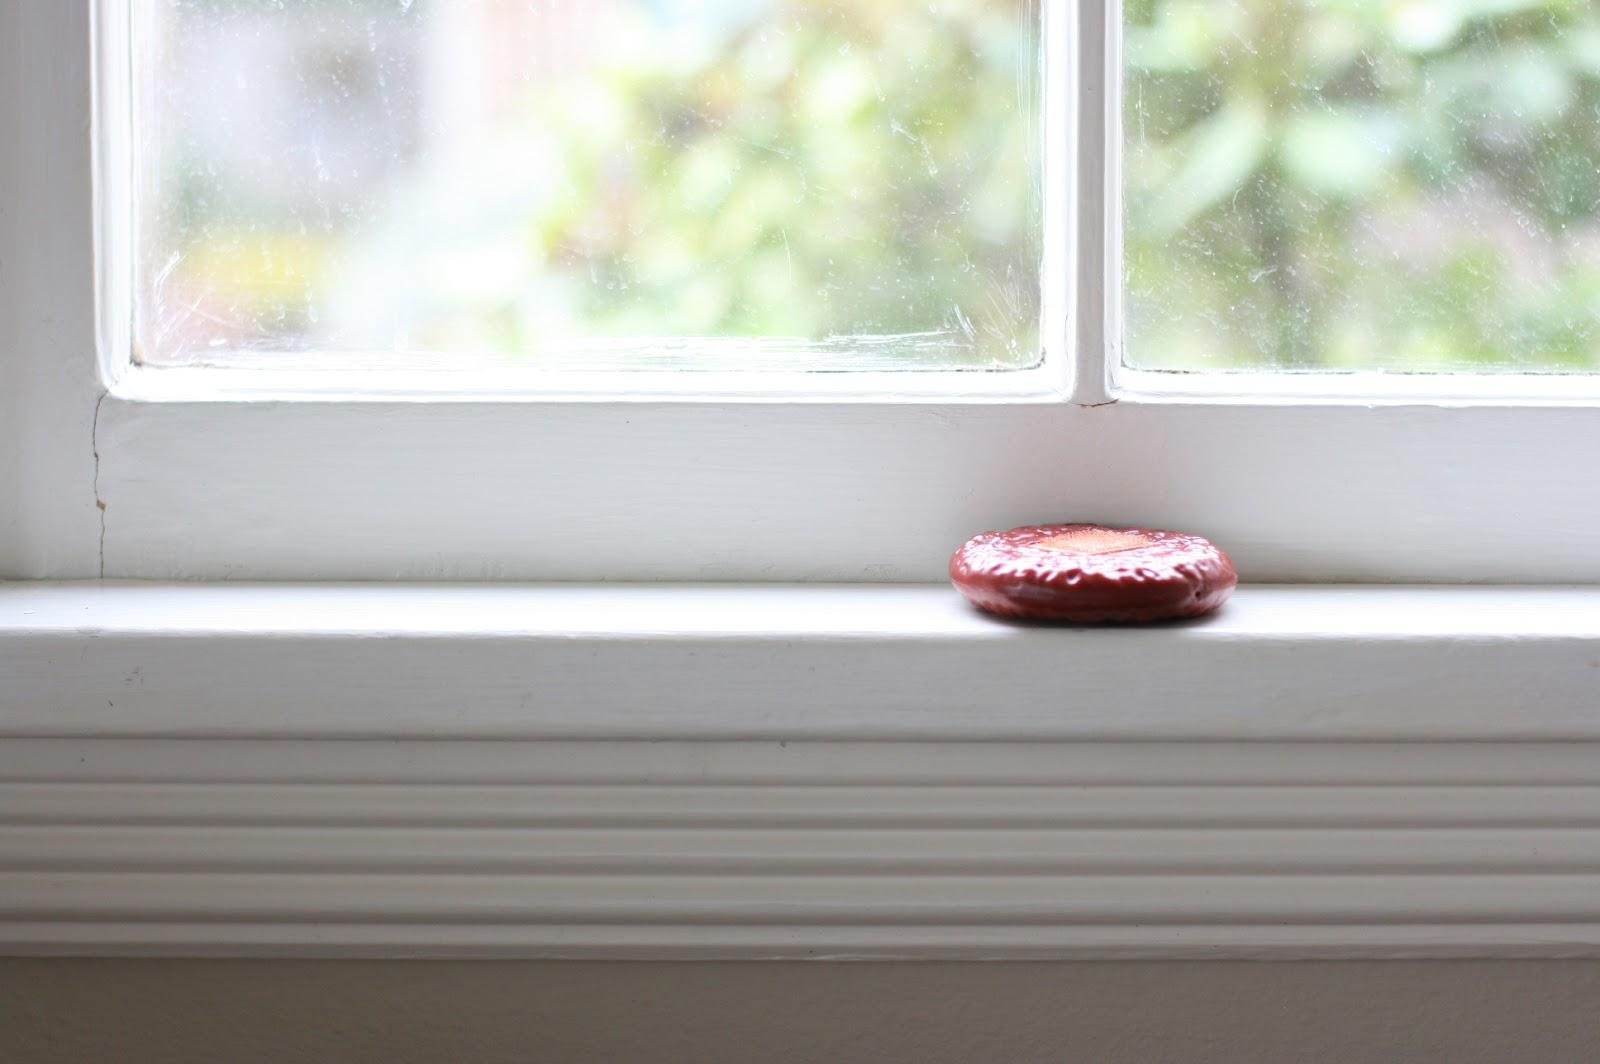 Gallery for interior window sill - Window sill or windowsill ...